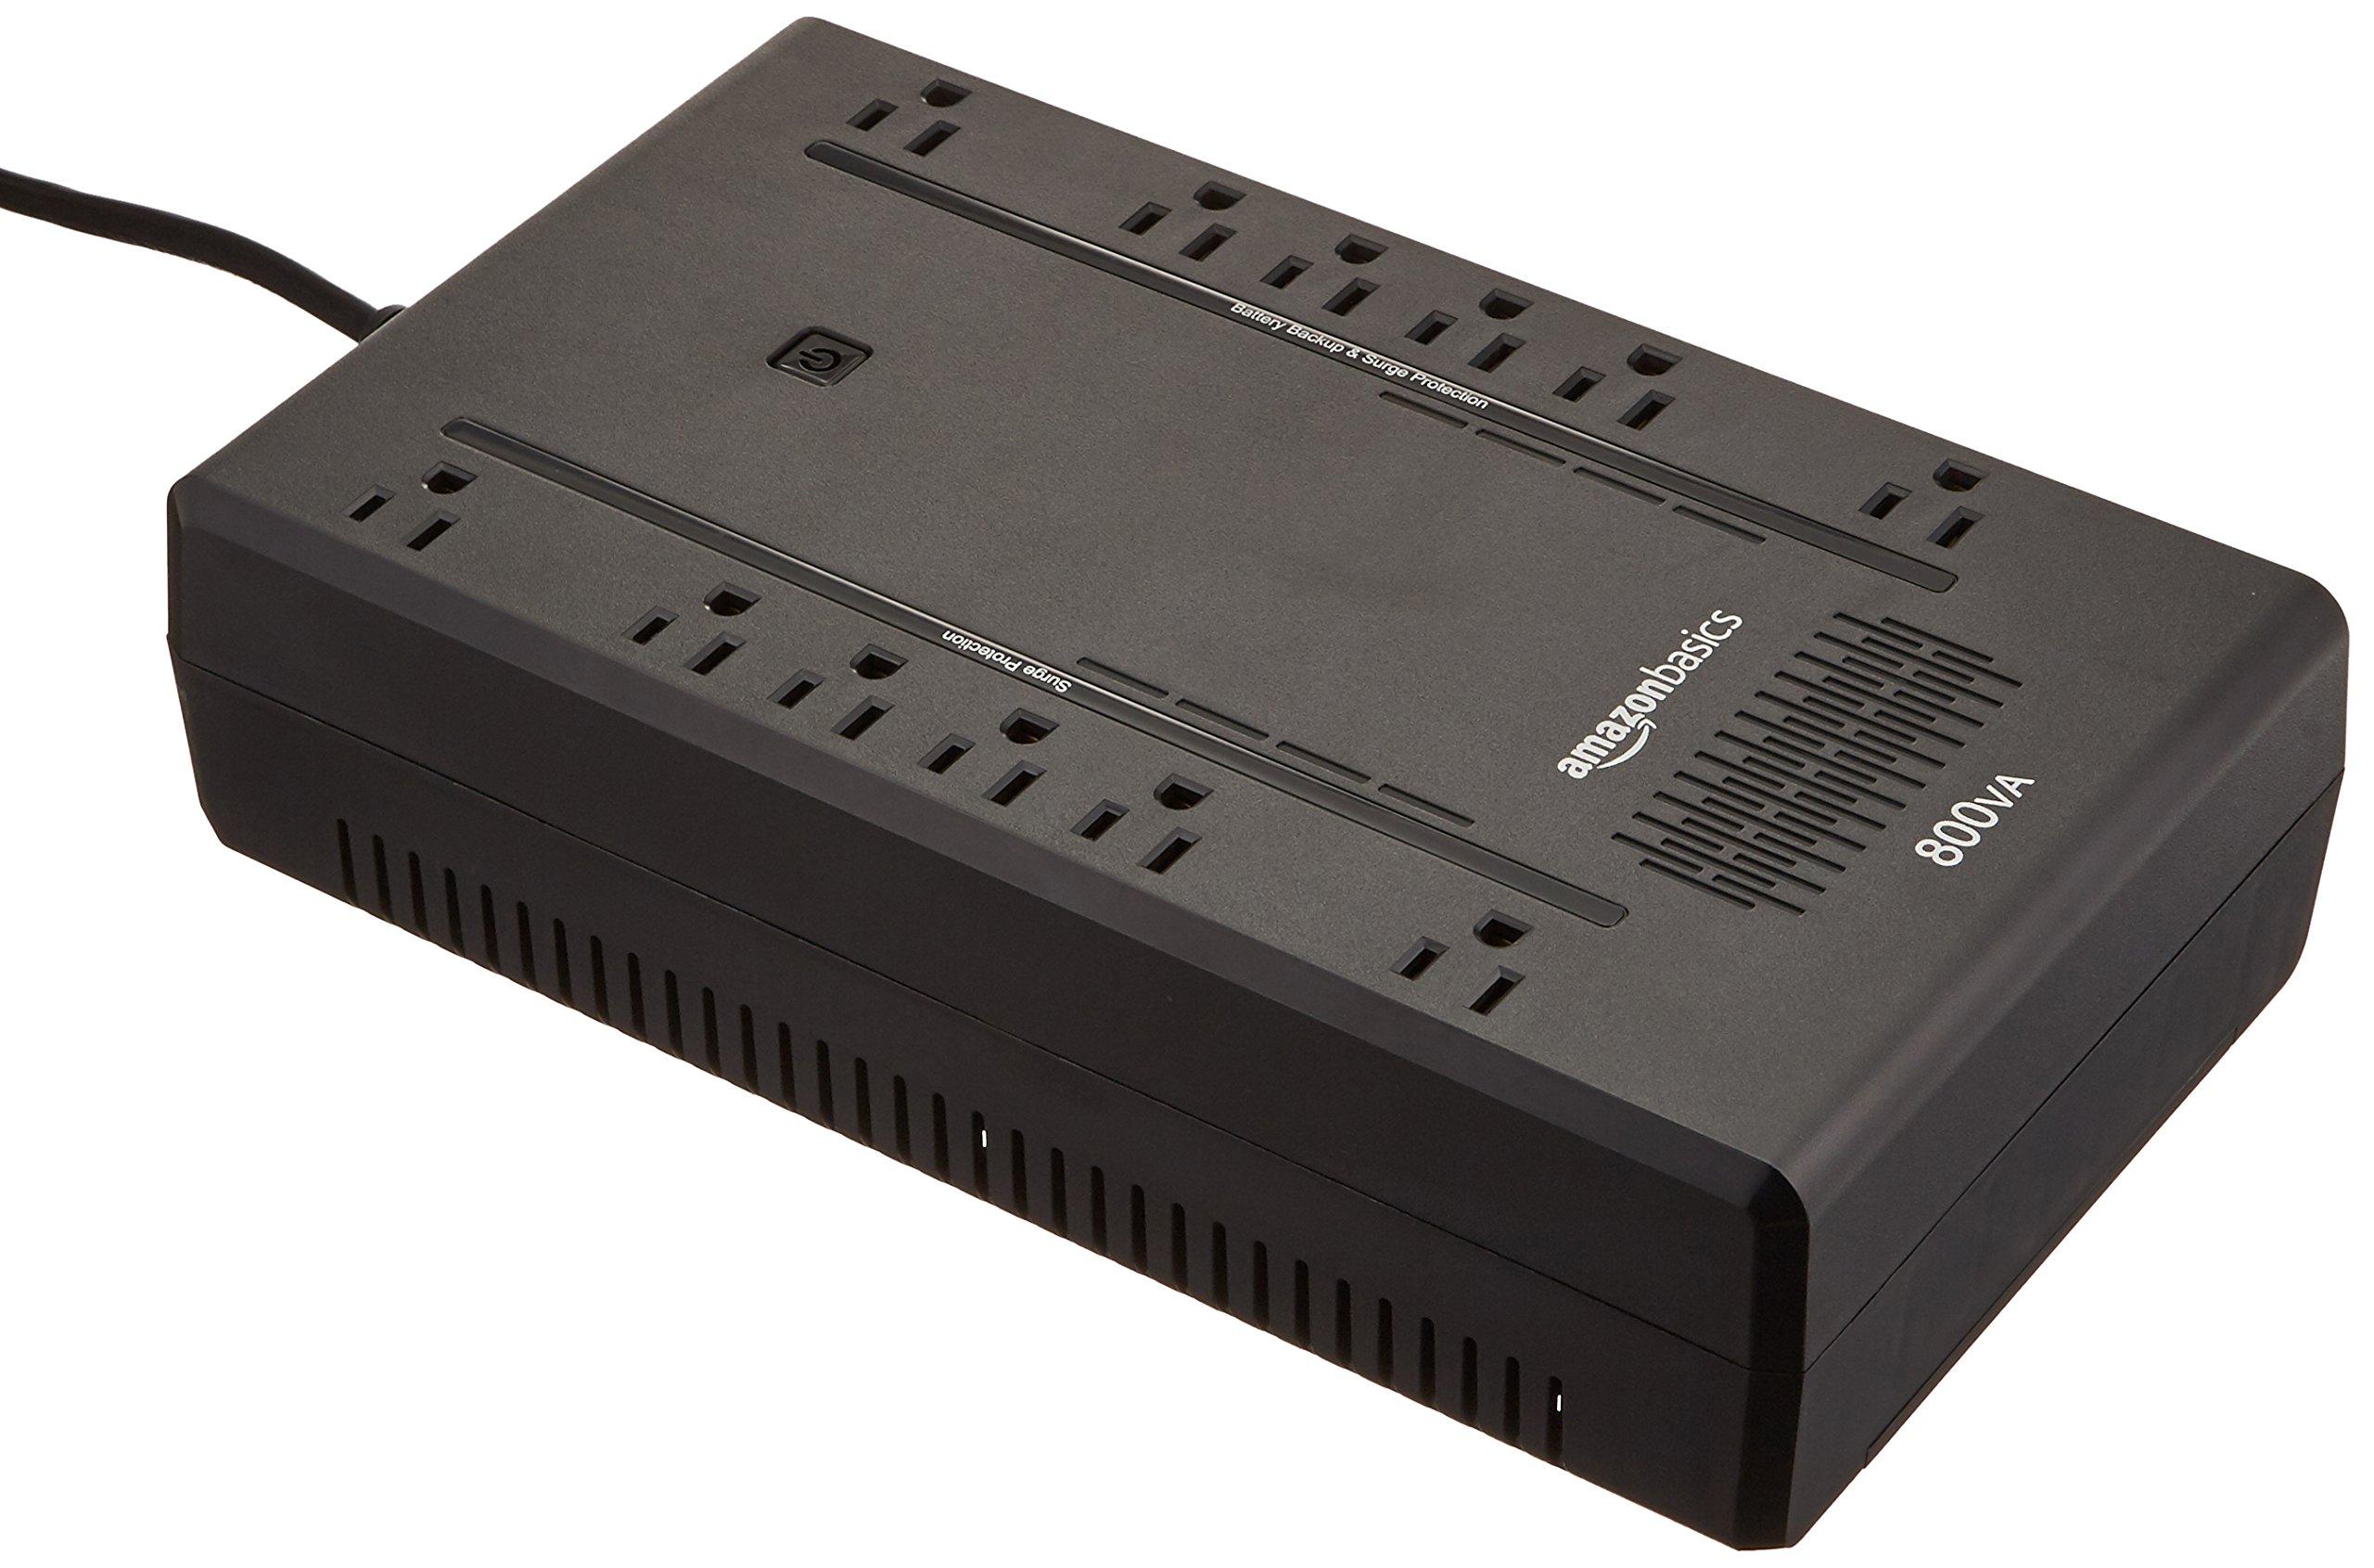 AmazonBasics Standby UPS 800VA 450W, 12 Outlets